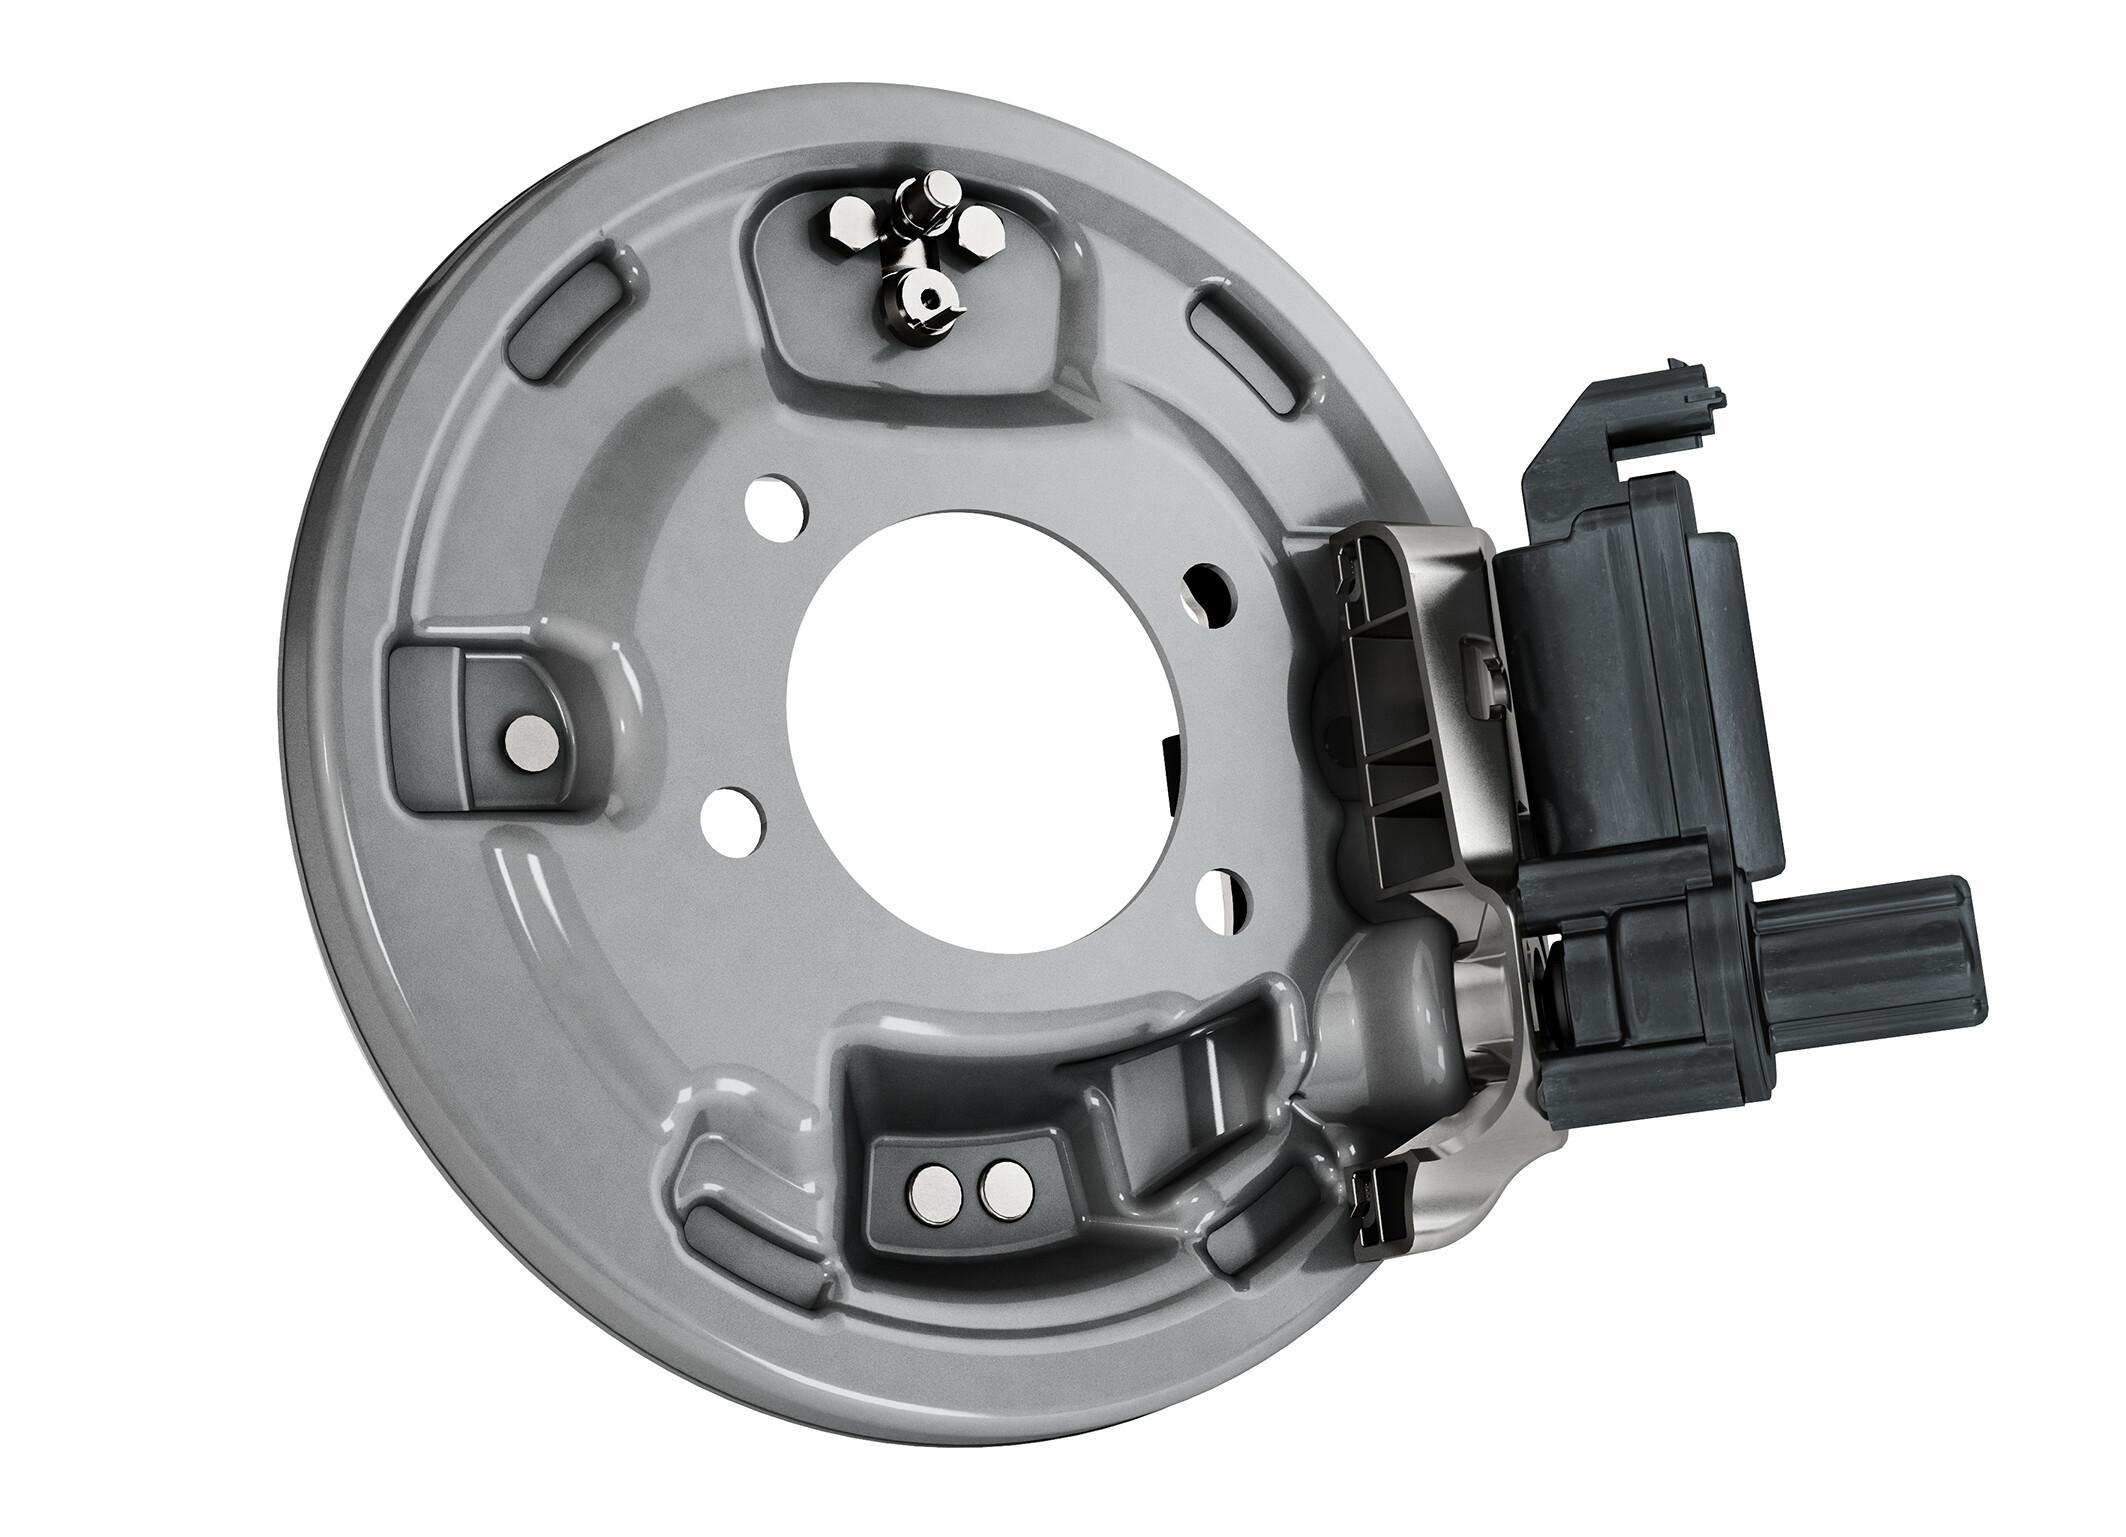 VW Continental drum brake